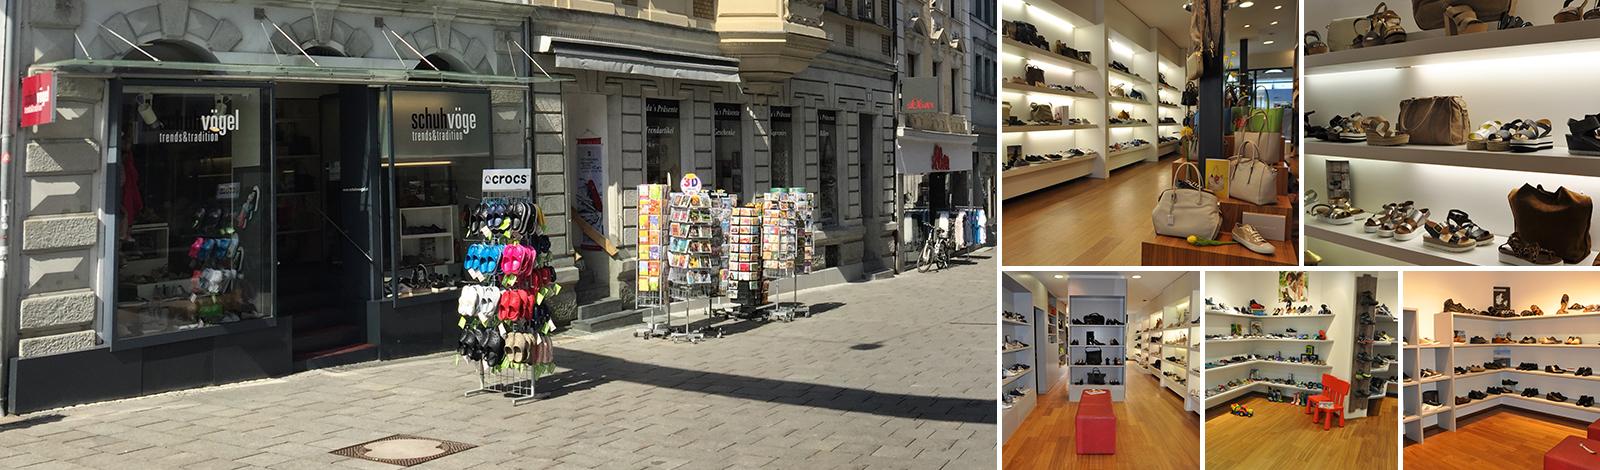 Collage Schuh Vögel Geschäft